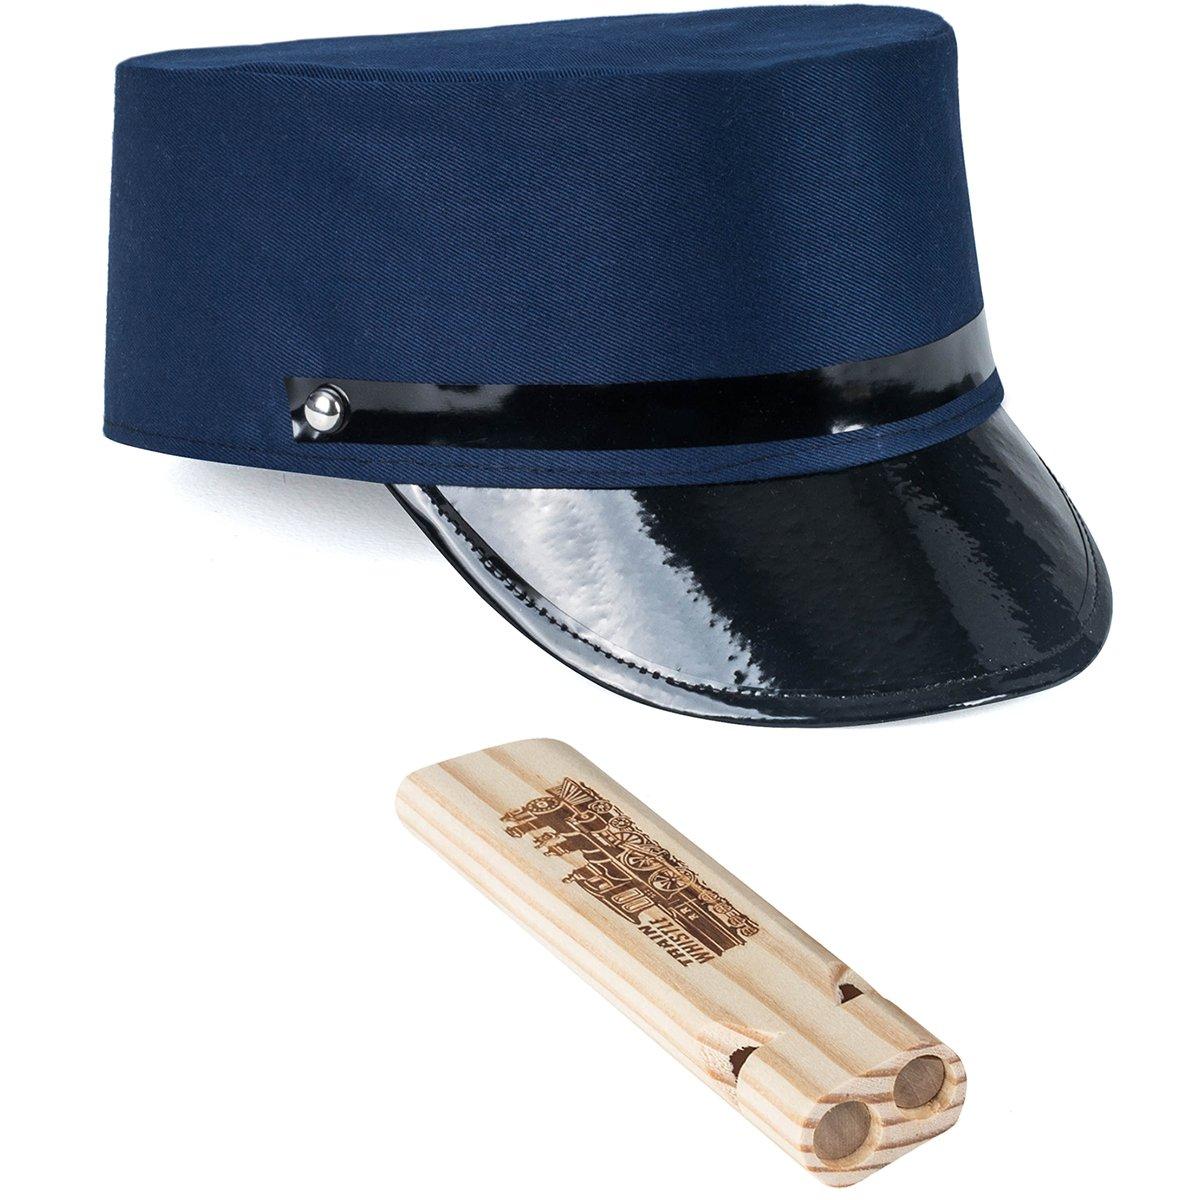 de119dee1bc Get Quotations · Tigerdoe Conductor Costume - Conductor Hat - Train Engineer  Costume - (2 Pc Set)